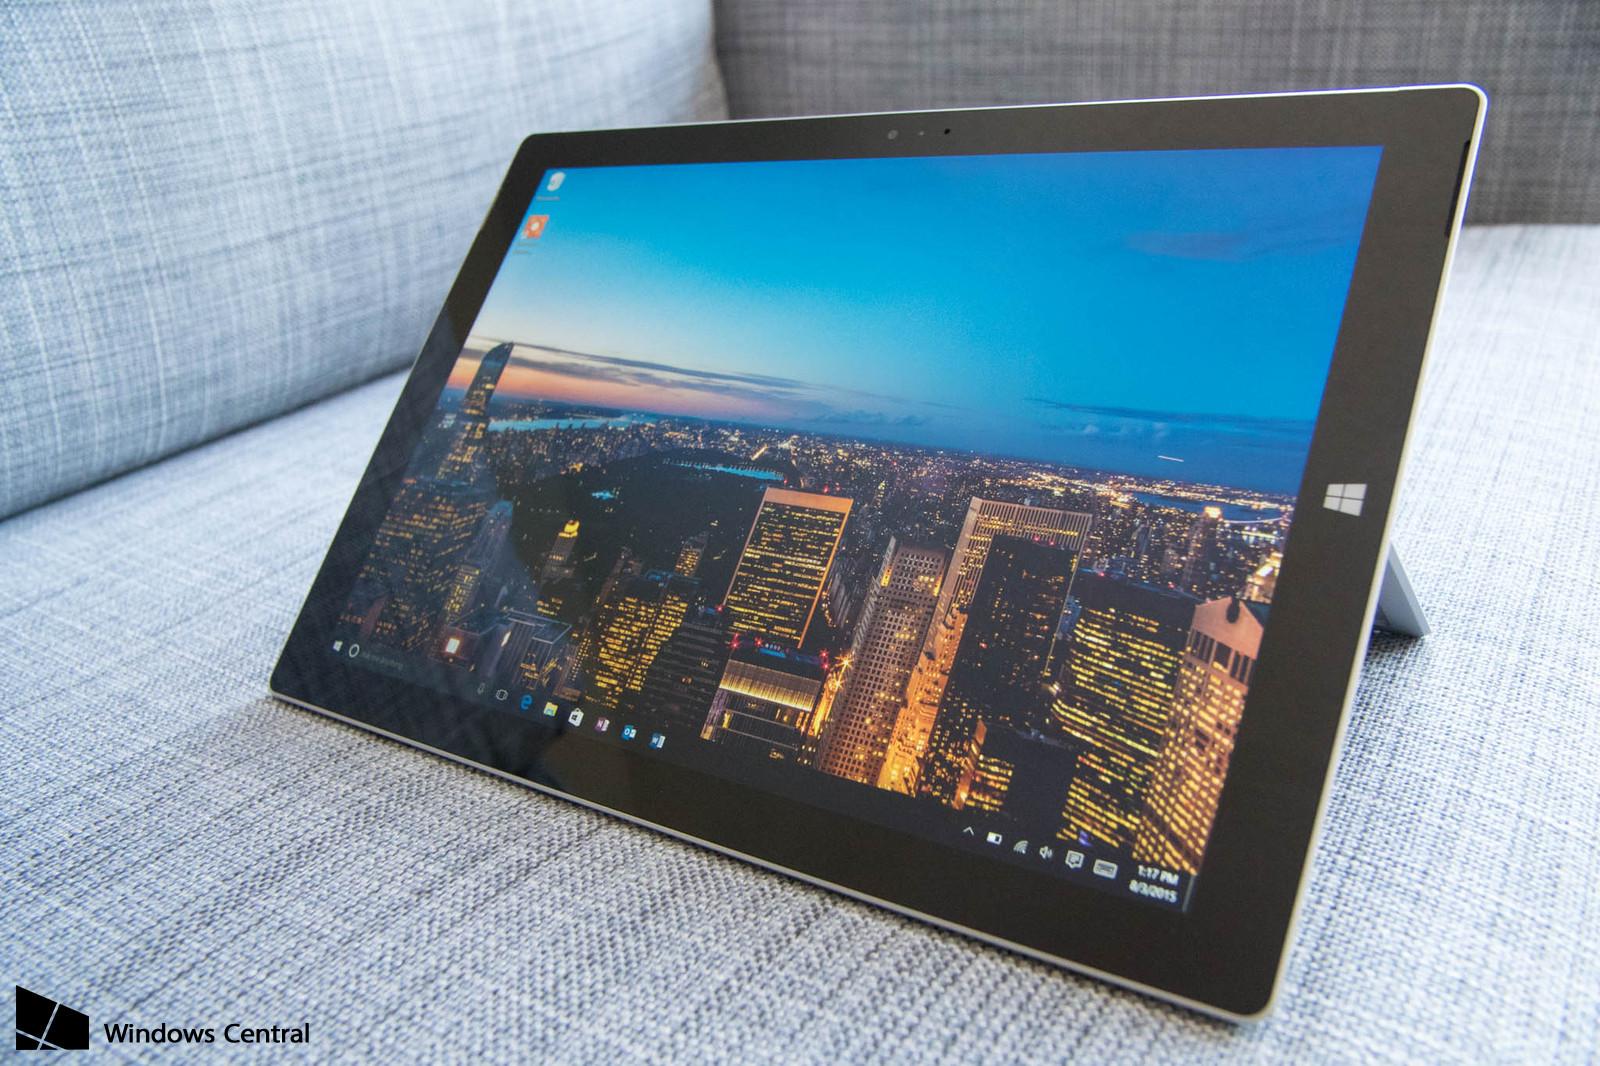 ... Surface Book Surface Pro 4 Microsoft Band 2 Windows 10 Surface Pro 3